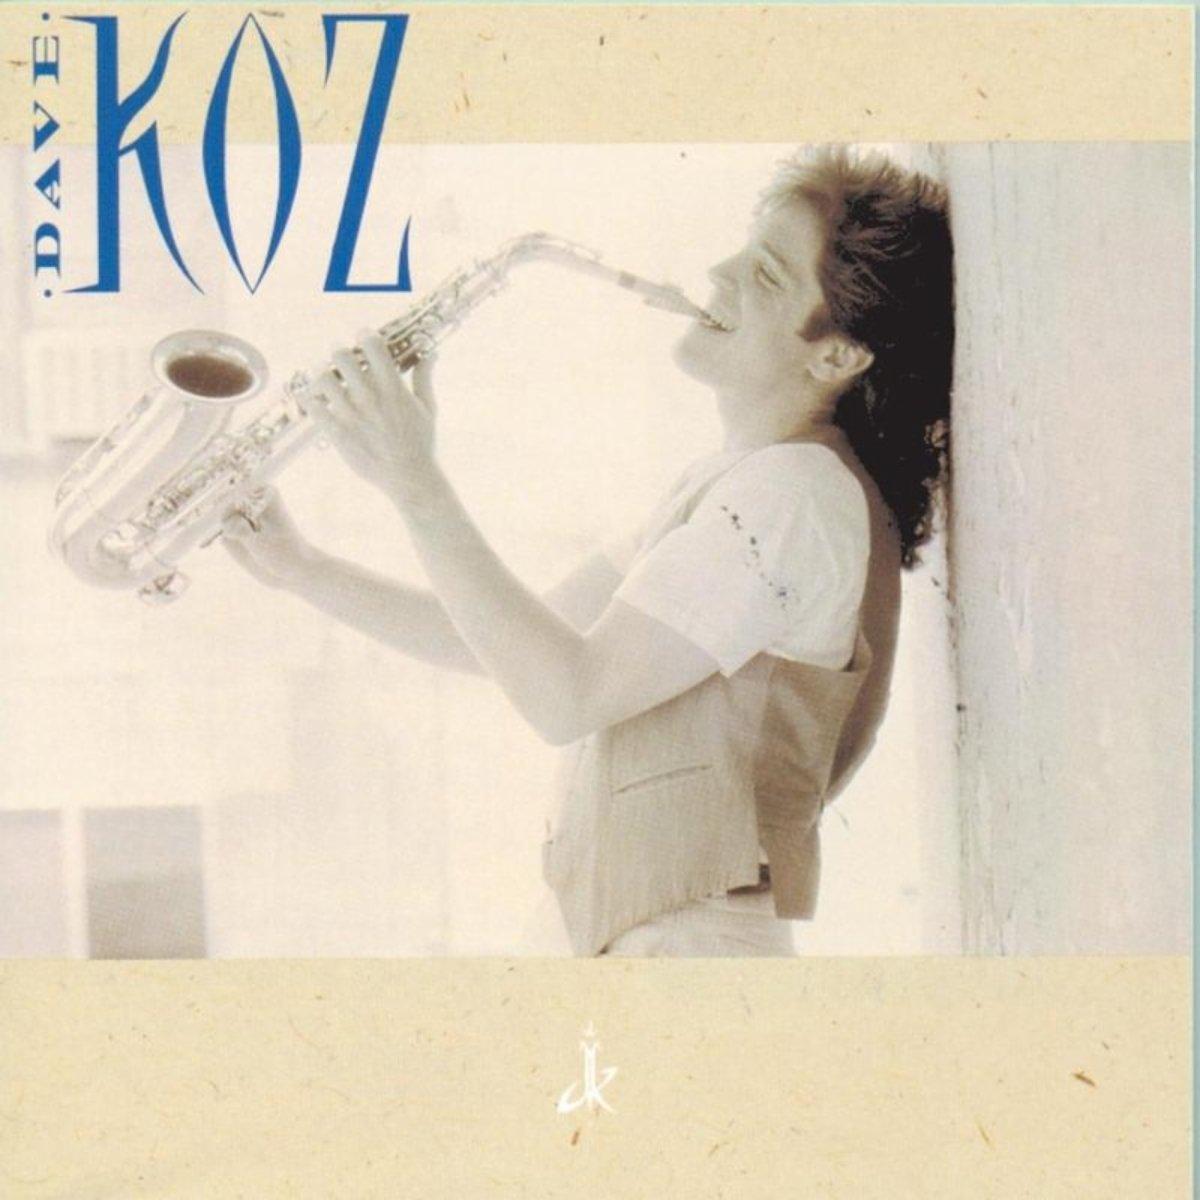 Dave Koz - Dave Koz (1990) [FLAC] Download